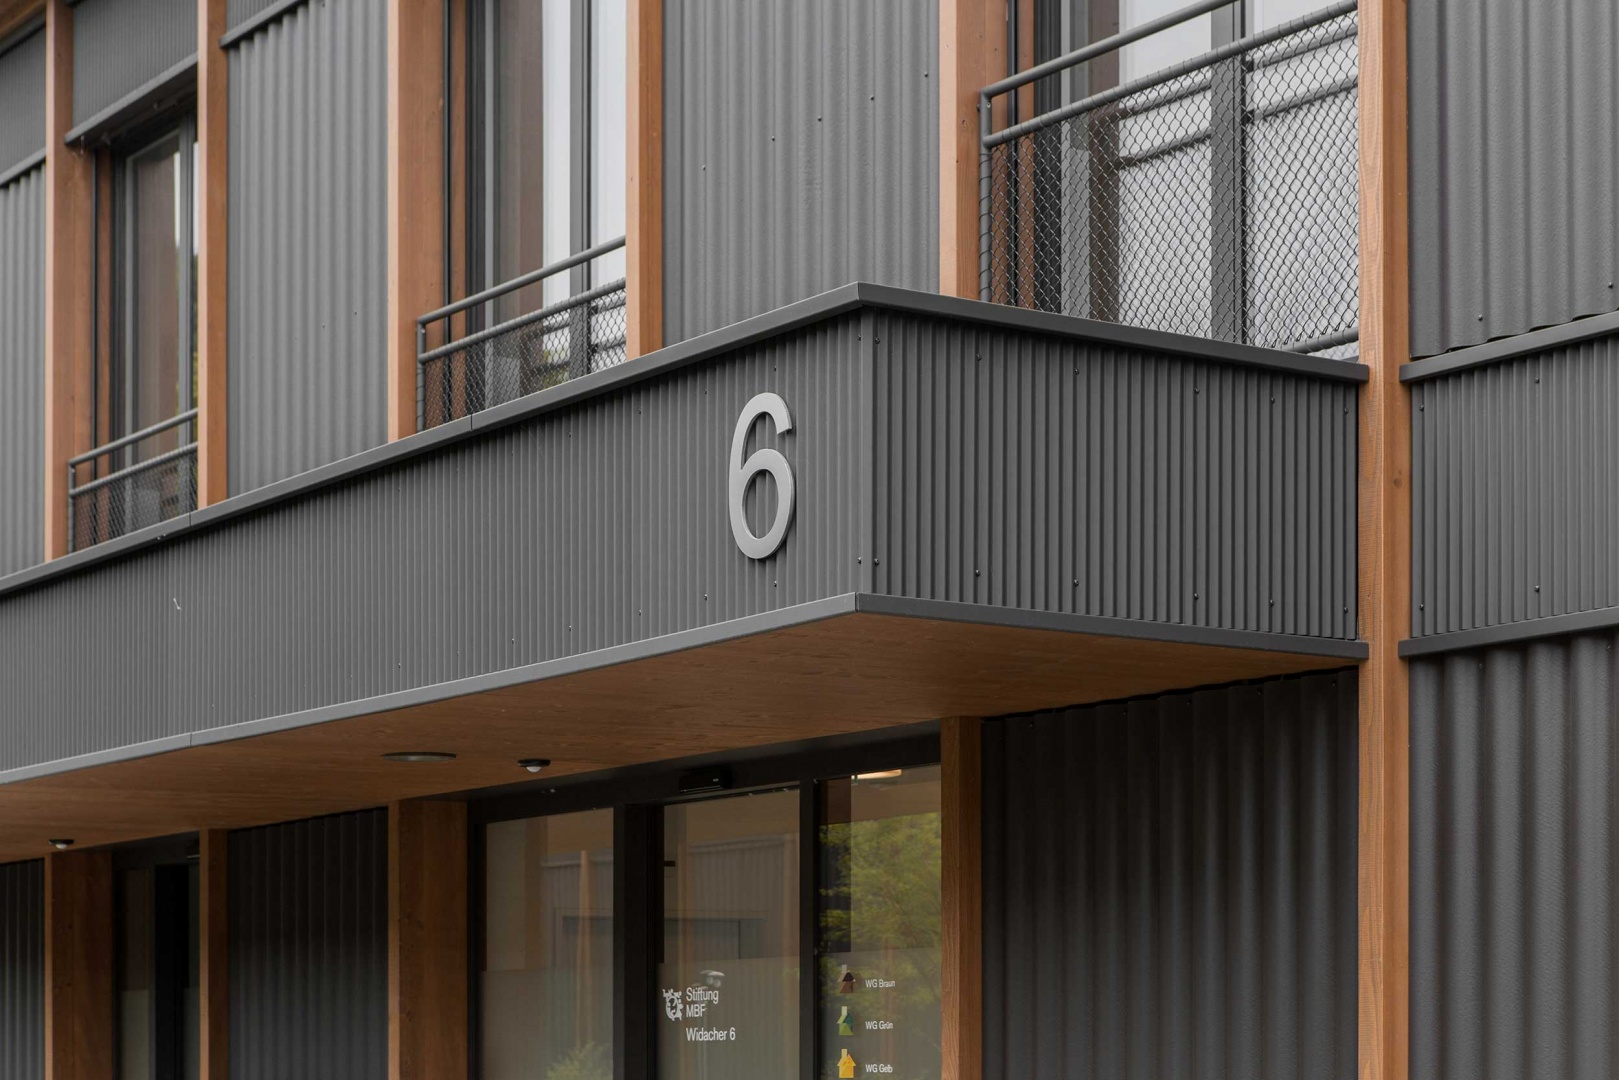 Detailaufnahme Fassade © Schmid Ziörjen Architektenkollektiv